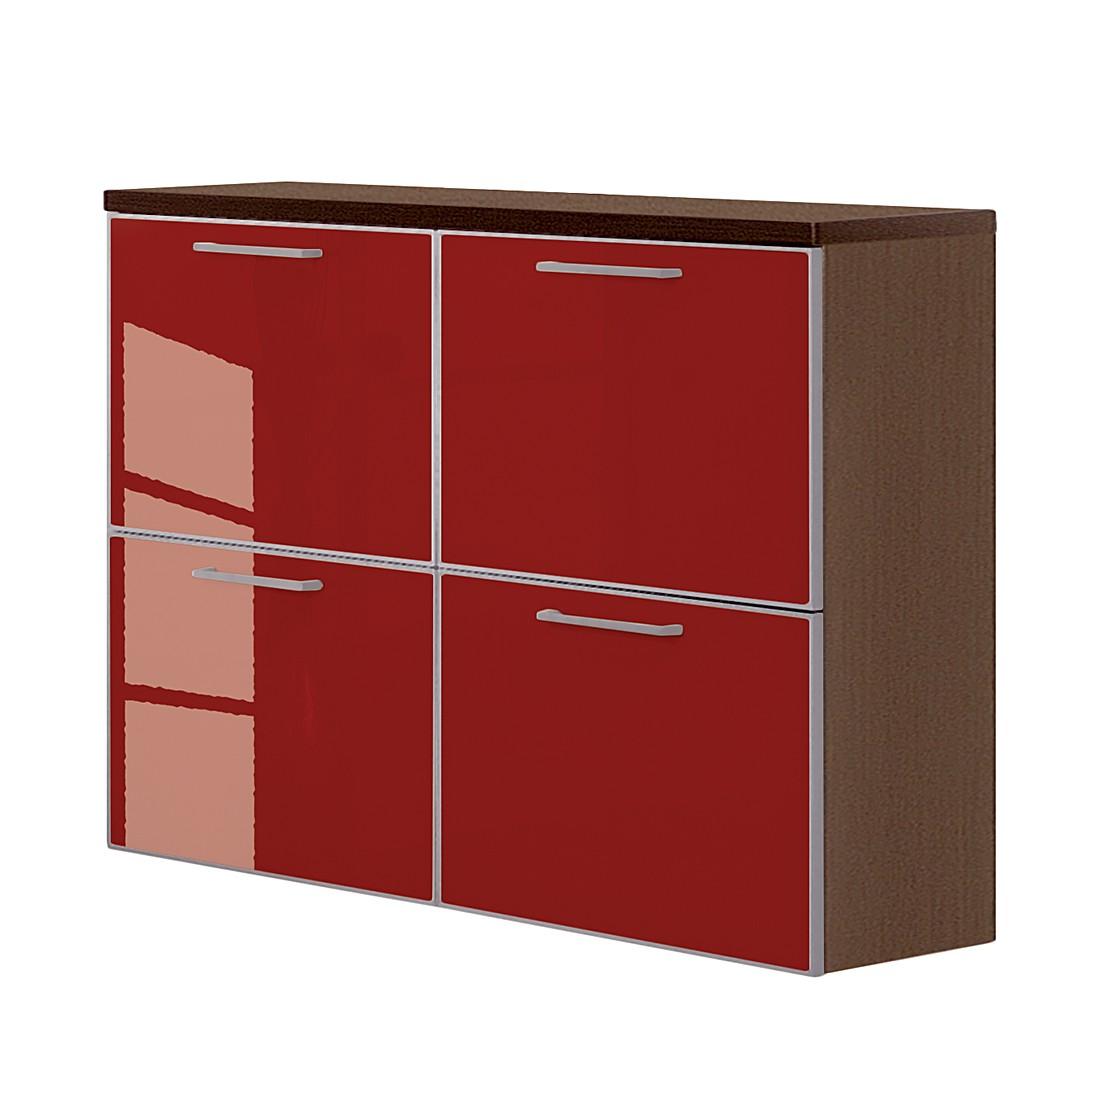 Hängeschuhschrank Sarota II – Wenge/Glas Rot, Voss jetzt bestellen